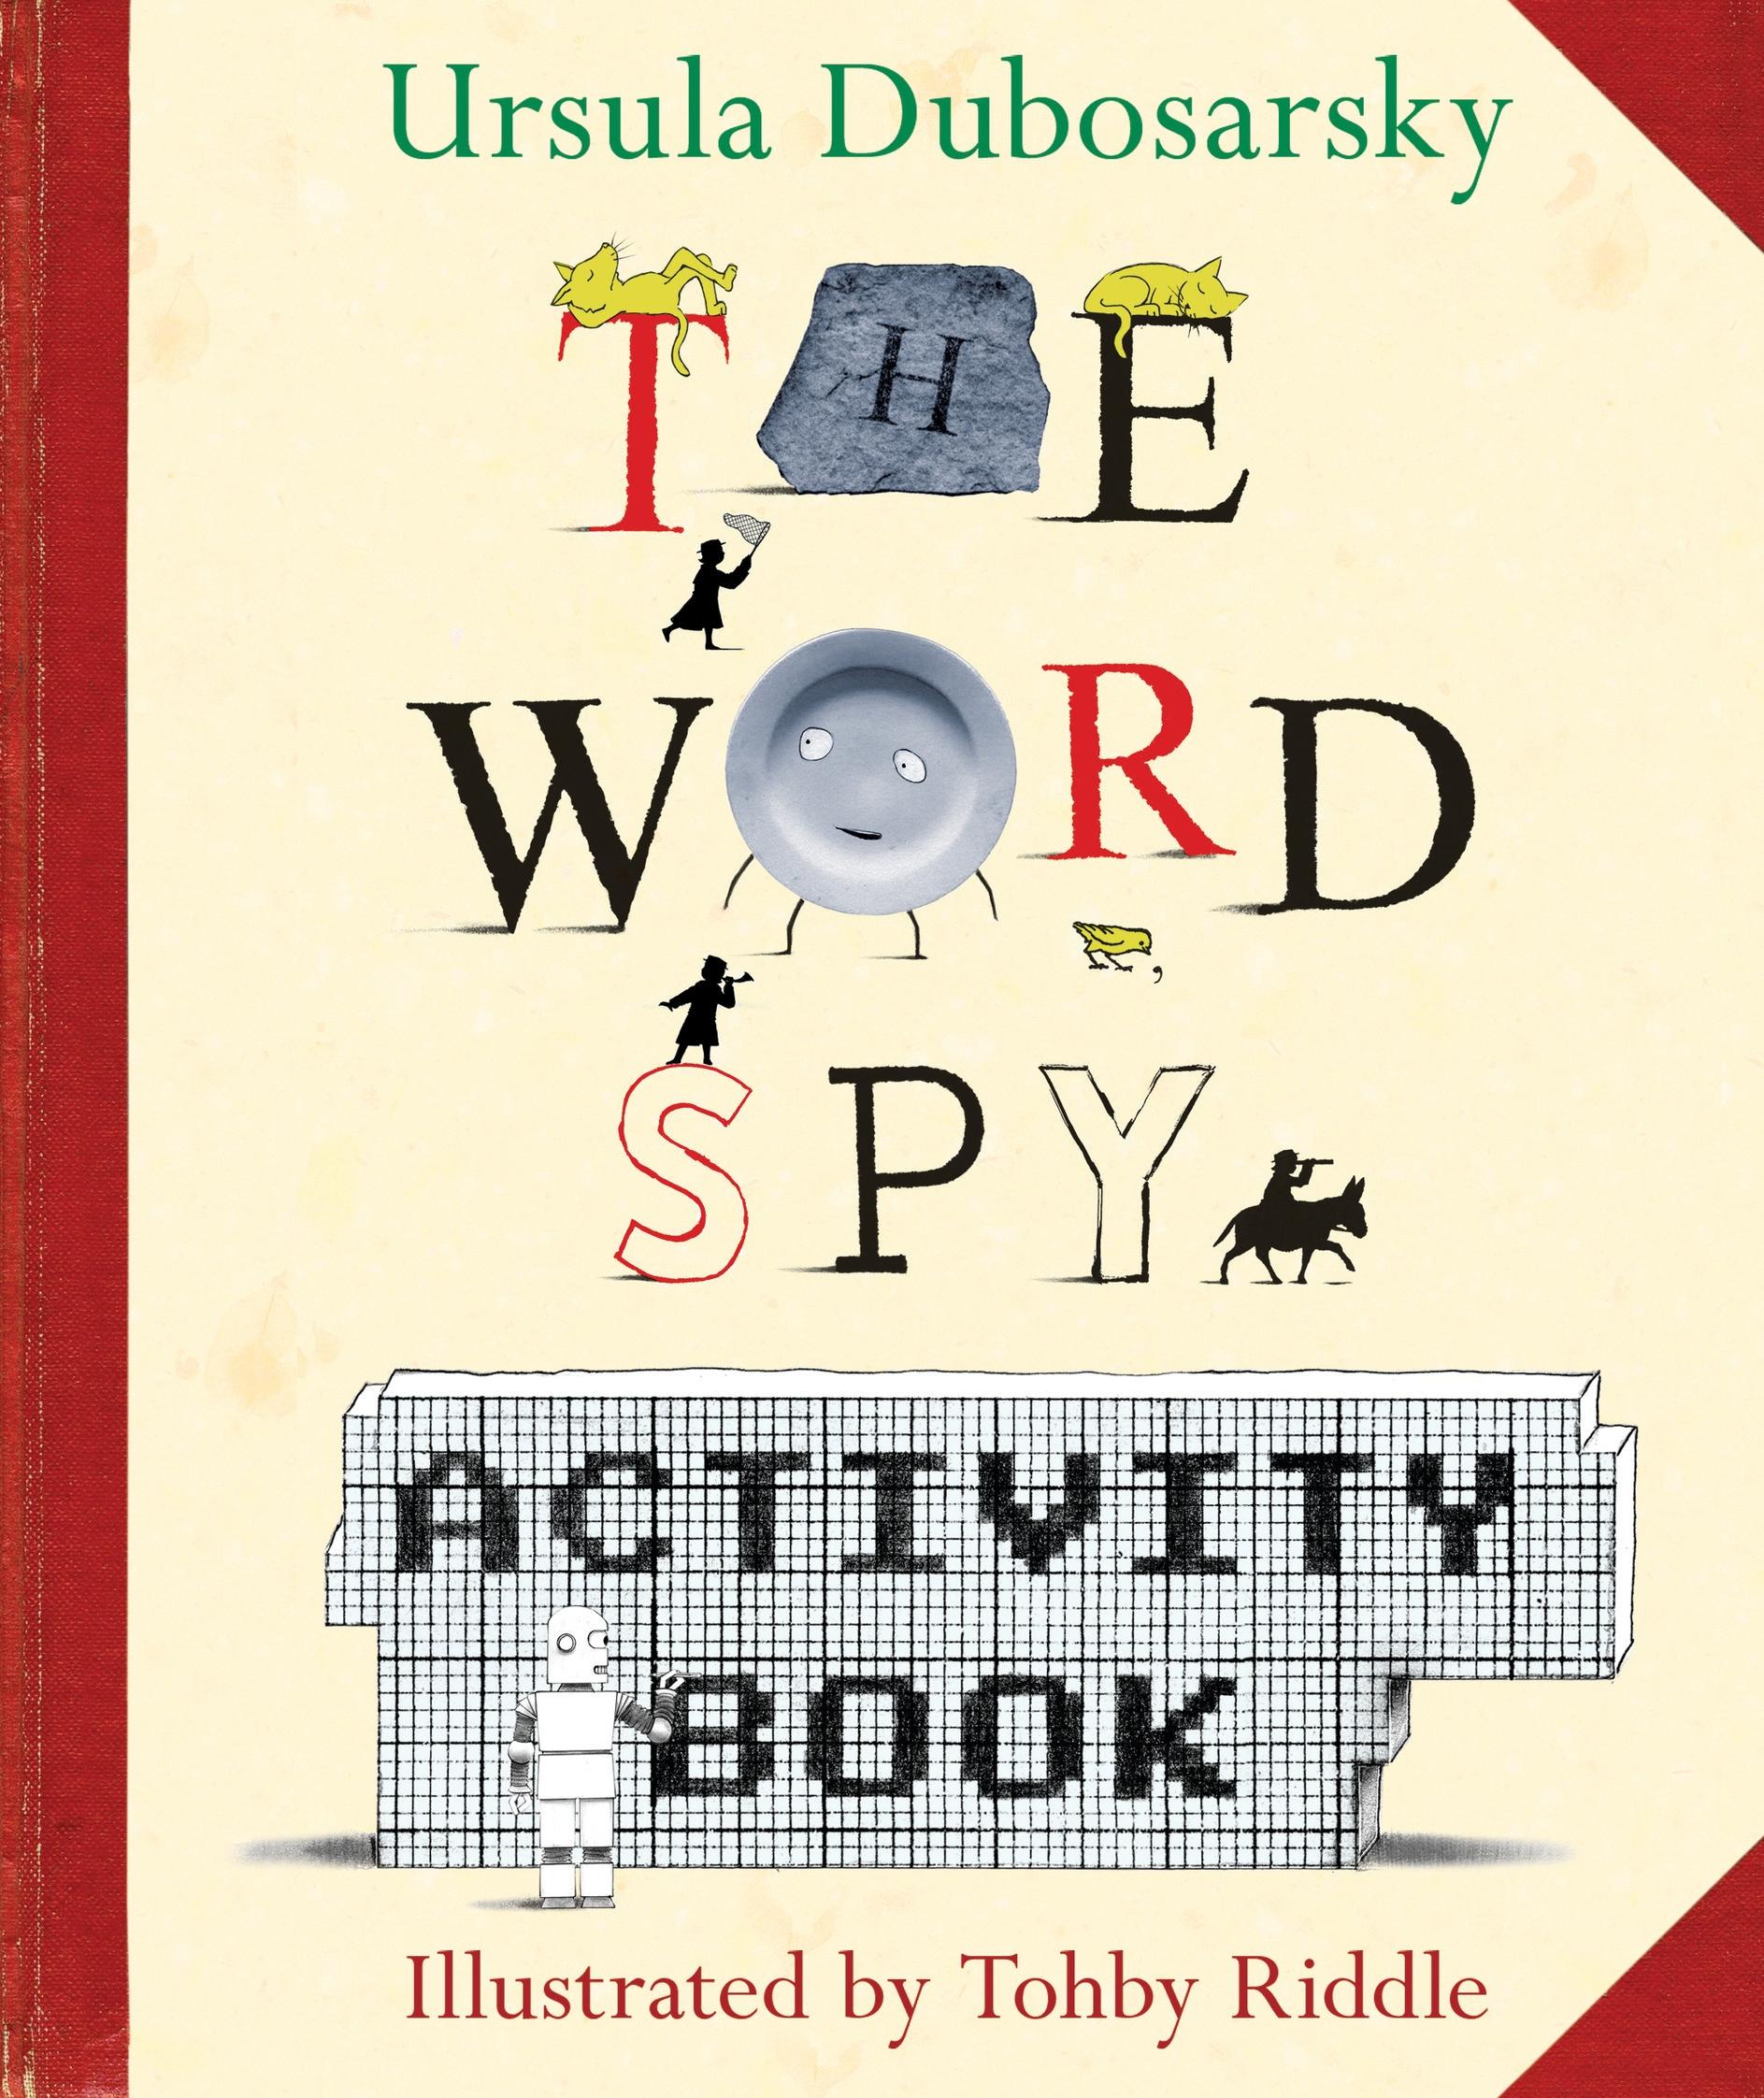 Word Spy Activity Book Hi Res cover.jpg